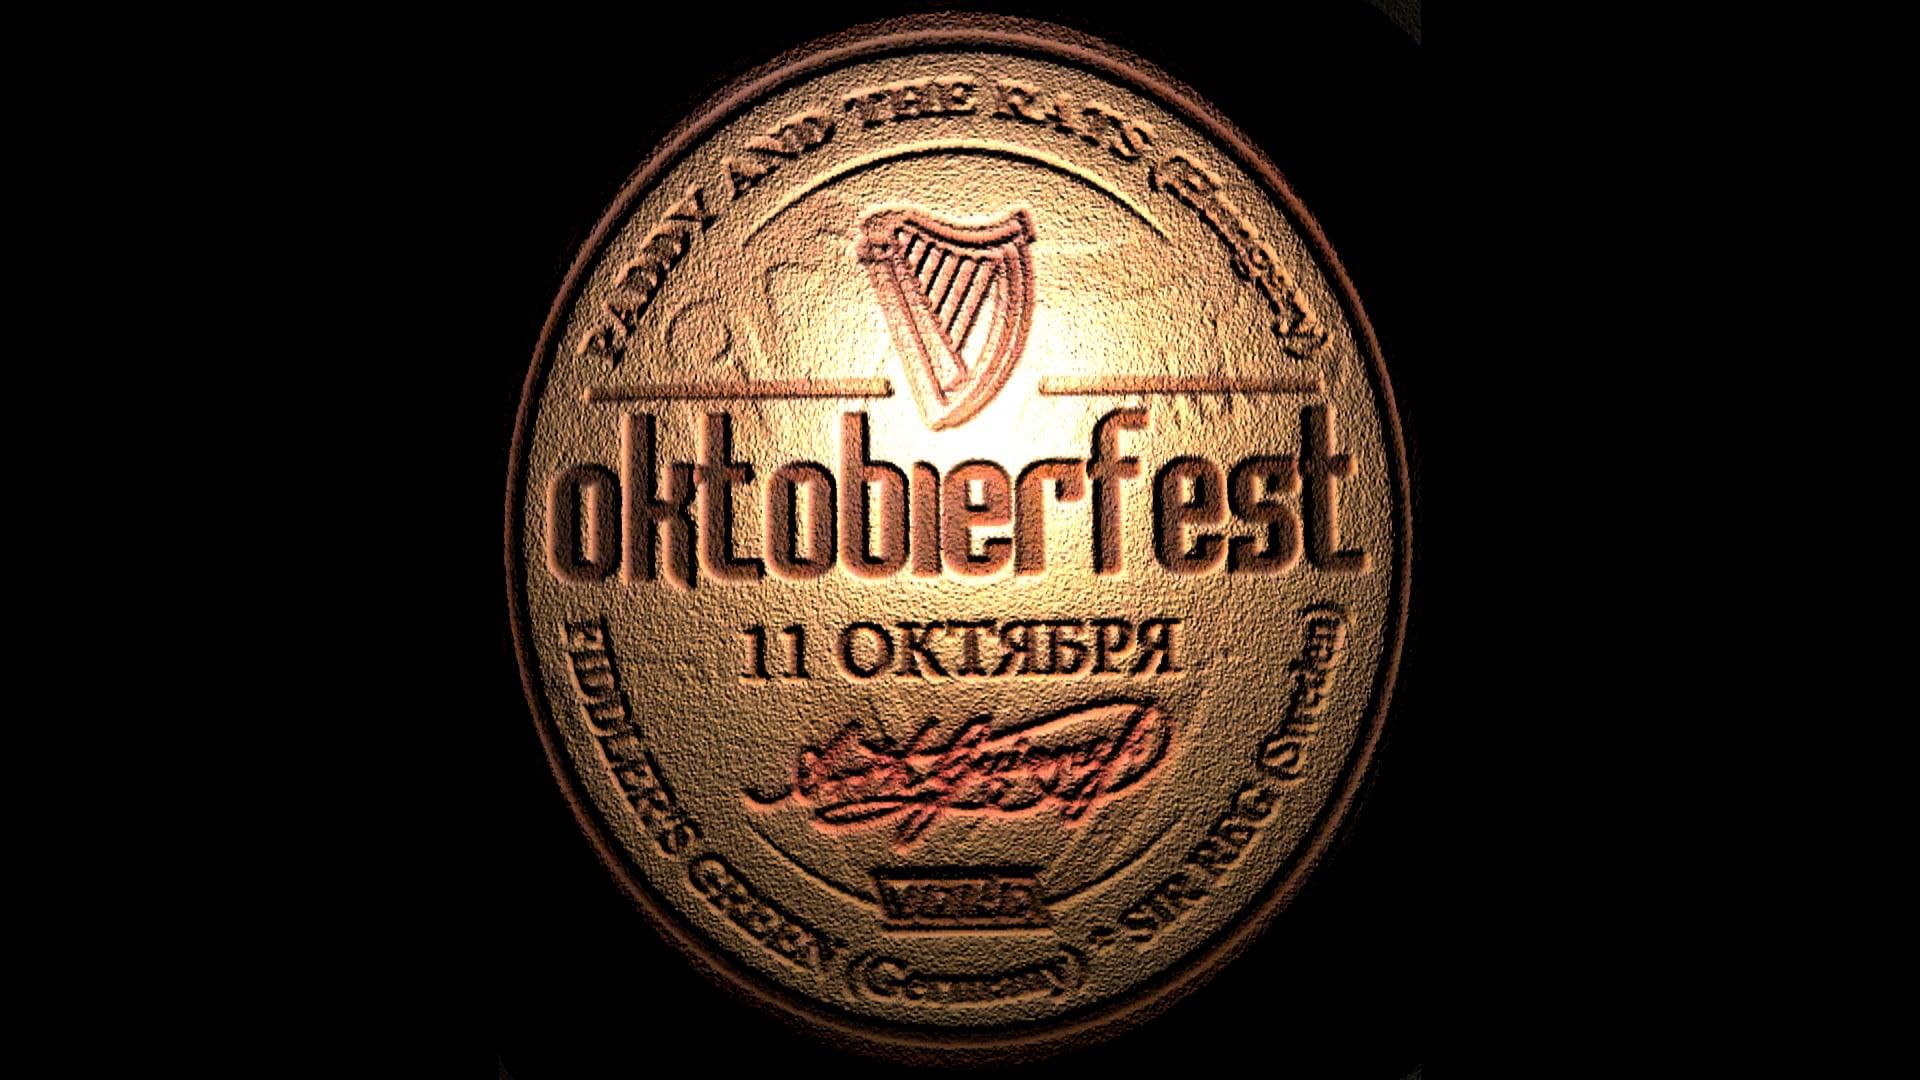 11 октября 2014. Oktobierfest. Volta. Репортаж